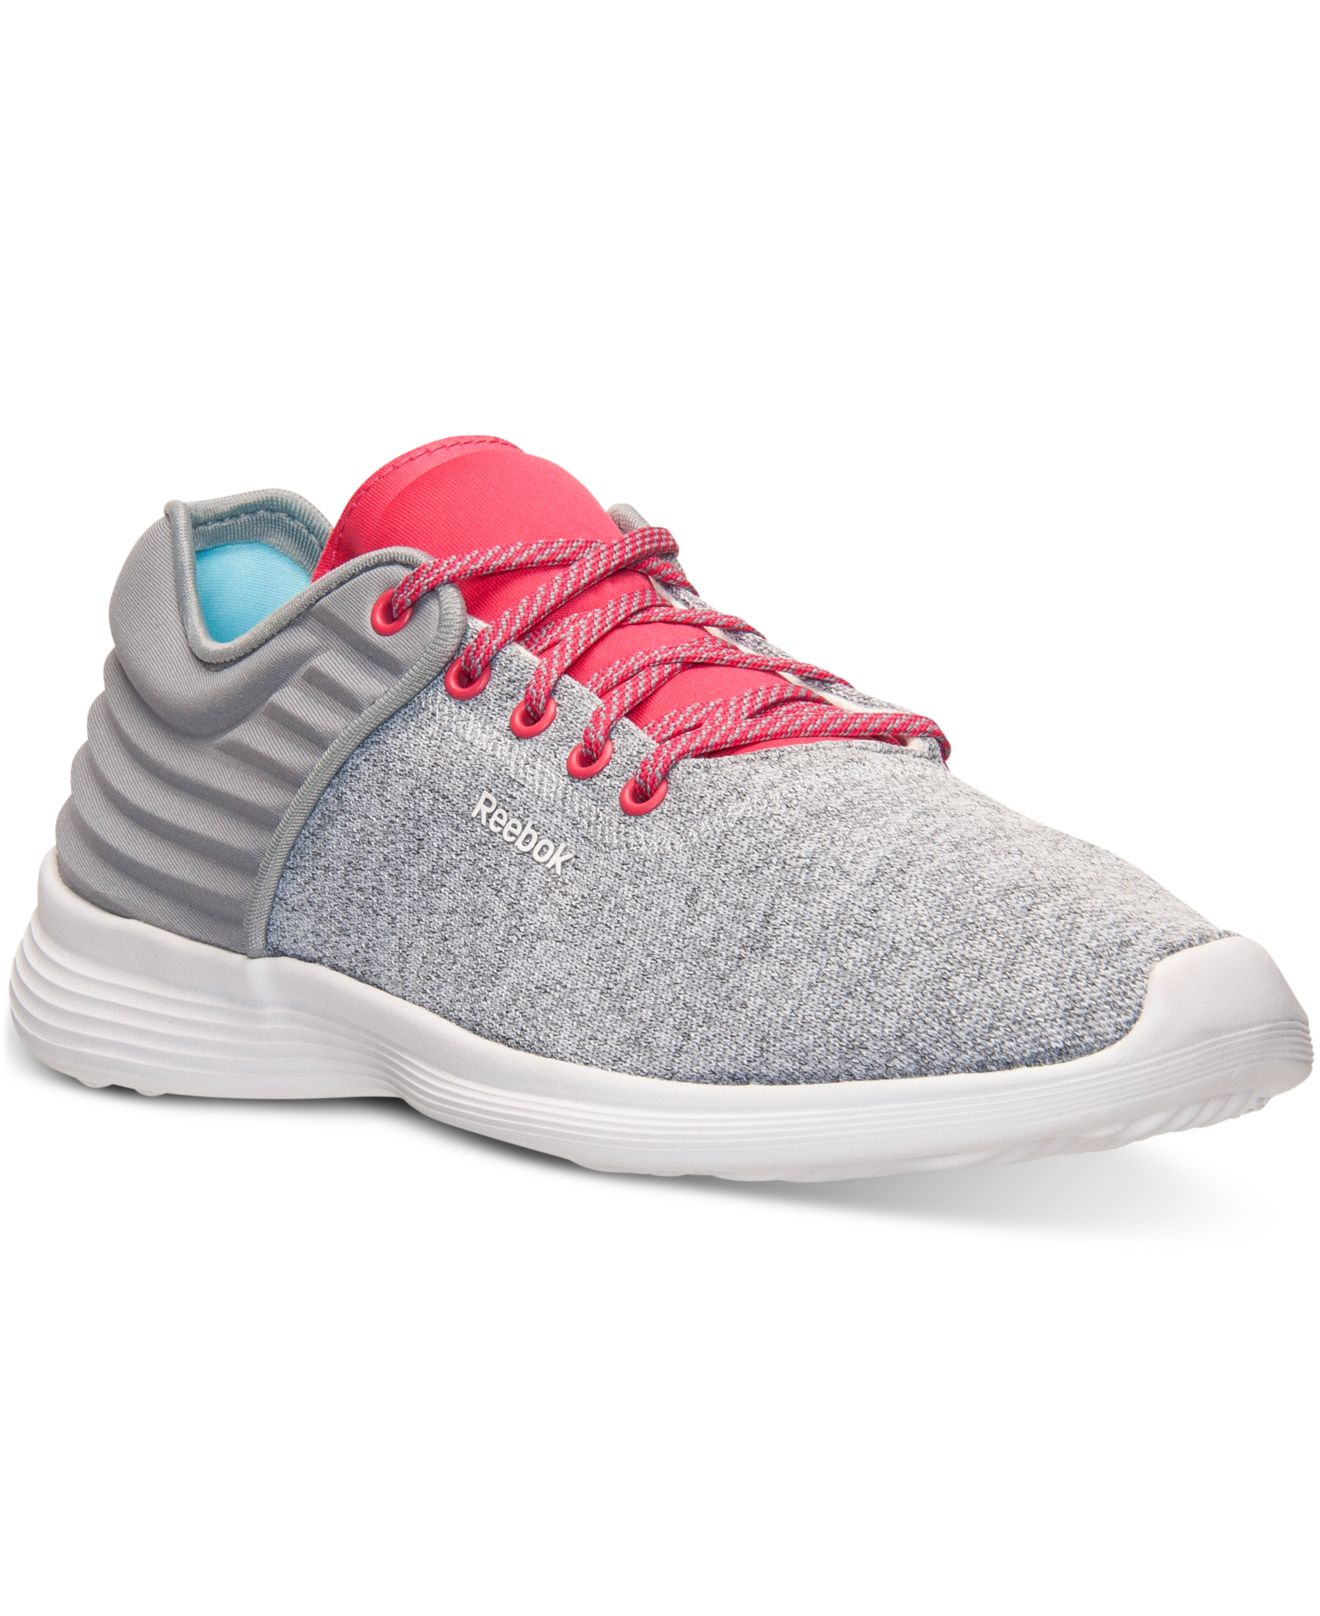 2fa2cdc9538831 Lyst - Reebok Women s Skyscape Fuse Walking Sneakers From Finish ...